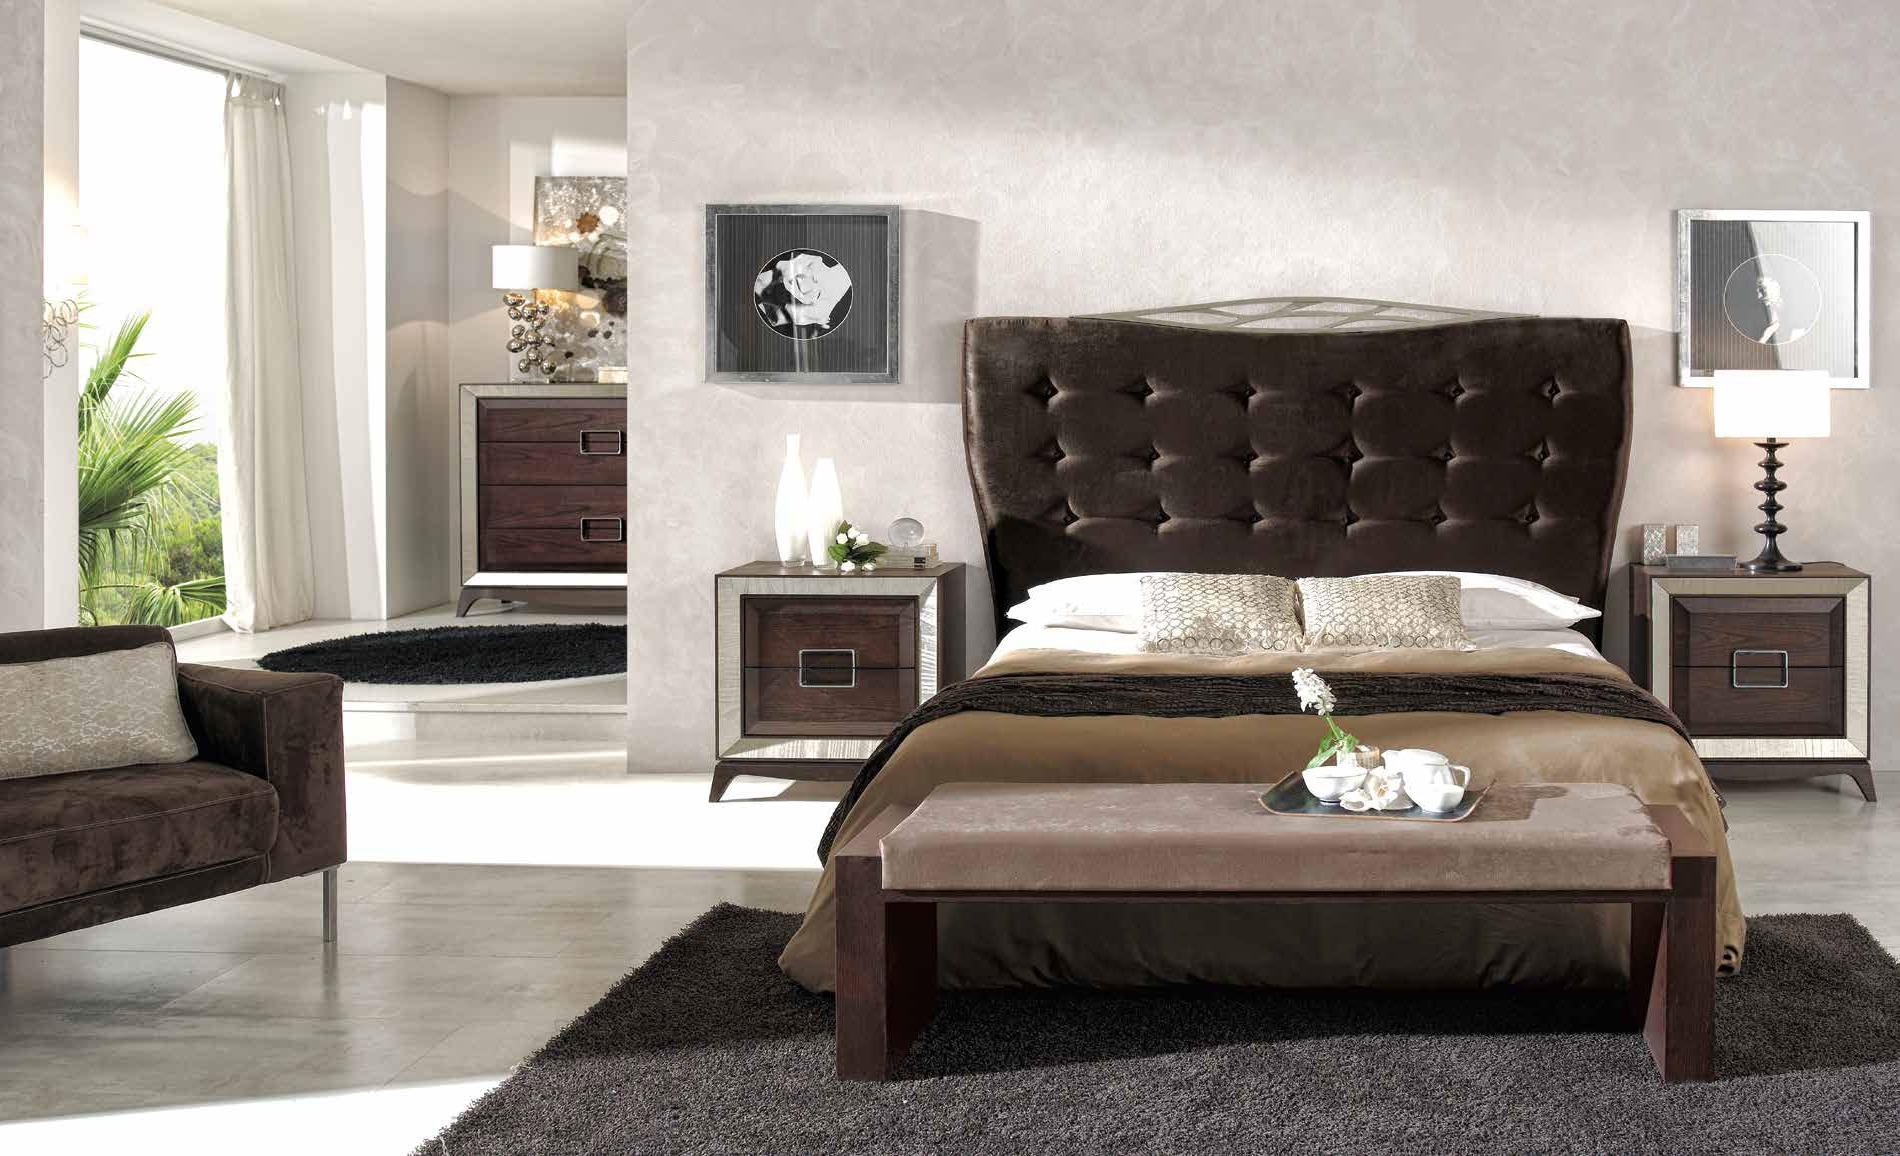 touch-dormitorio-atlanta-01